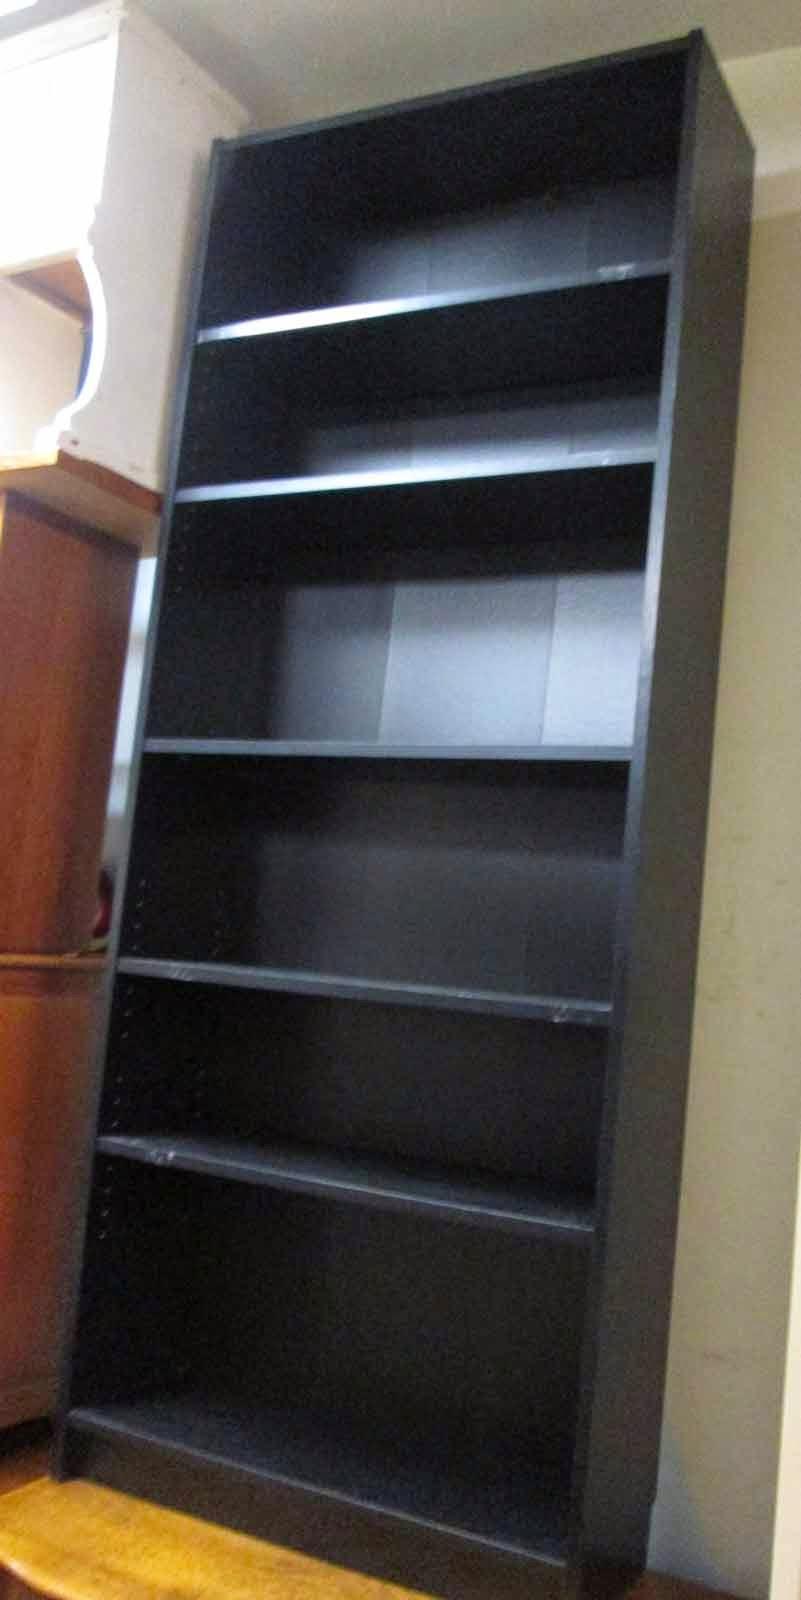 Uhuru Furniture & Collectibles Sold Tall Black Bookcase  $25